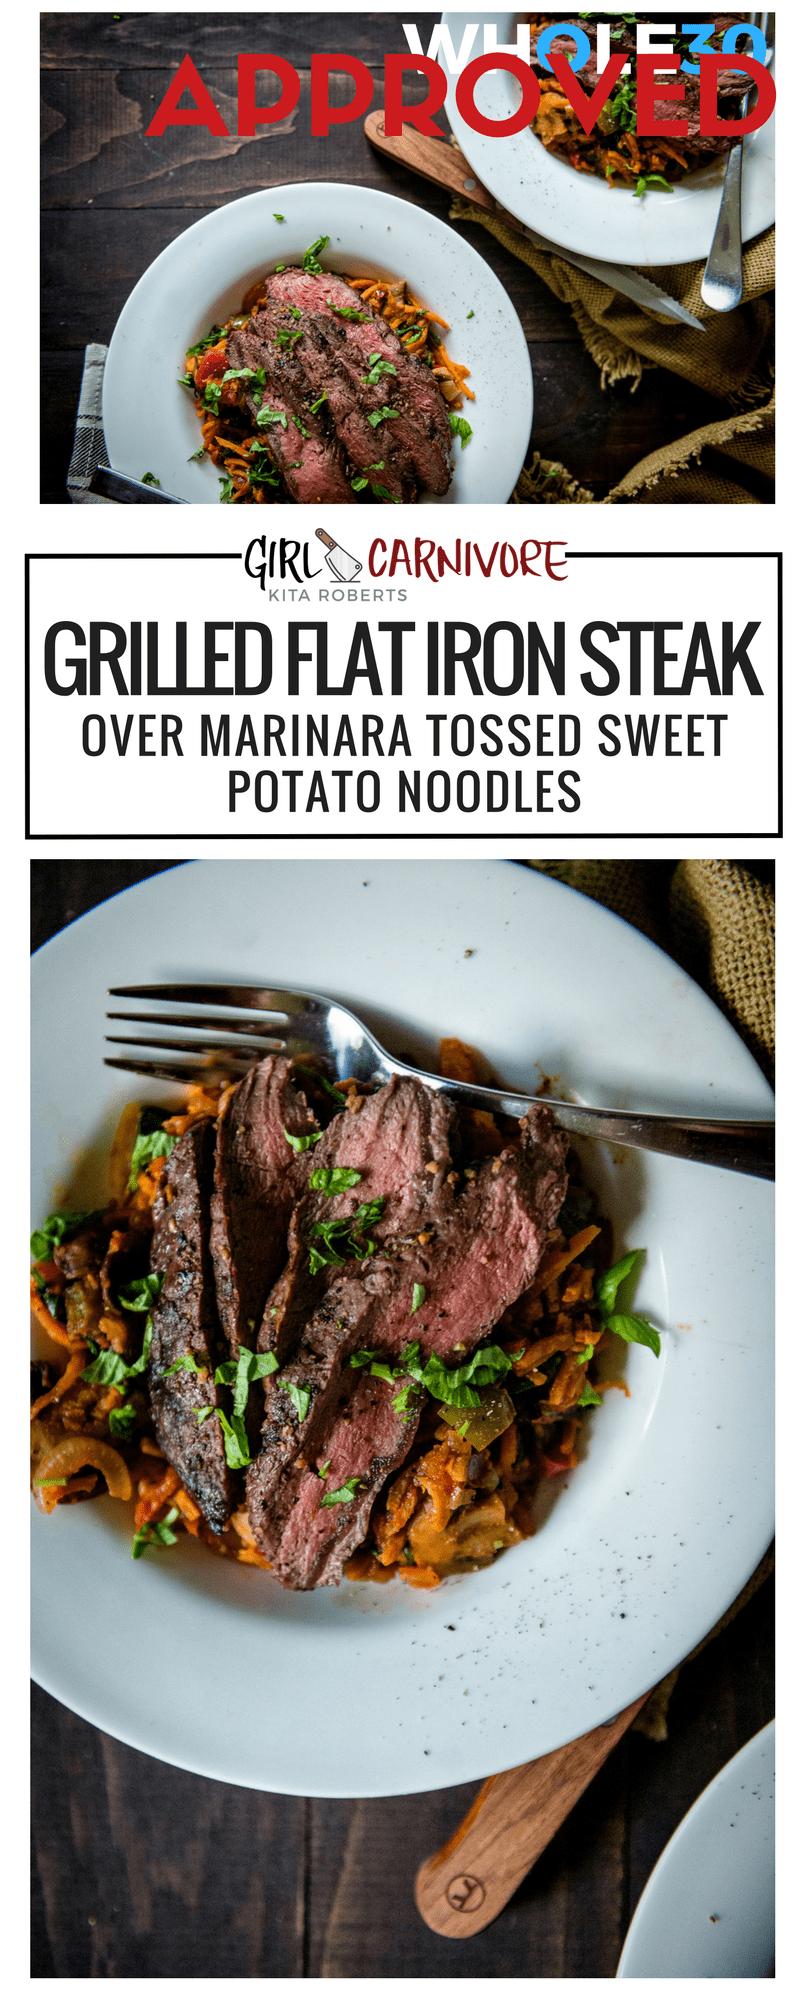 Whole 30 Grilled Flat Iron Steak Over Marinara Tossed Sweet Potato Noodles